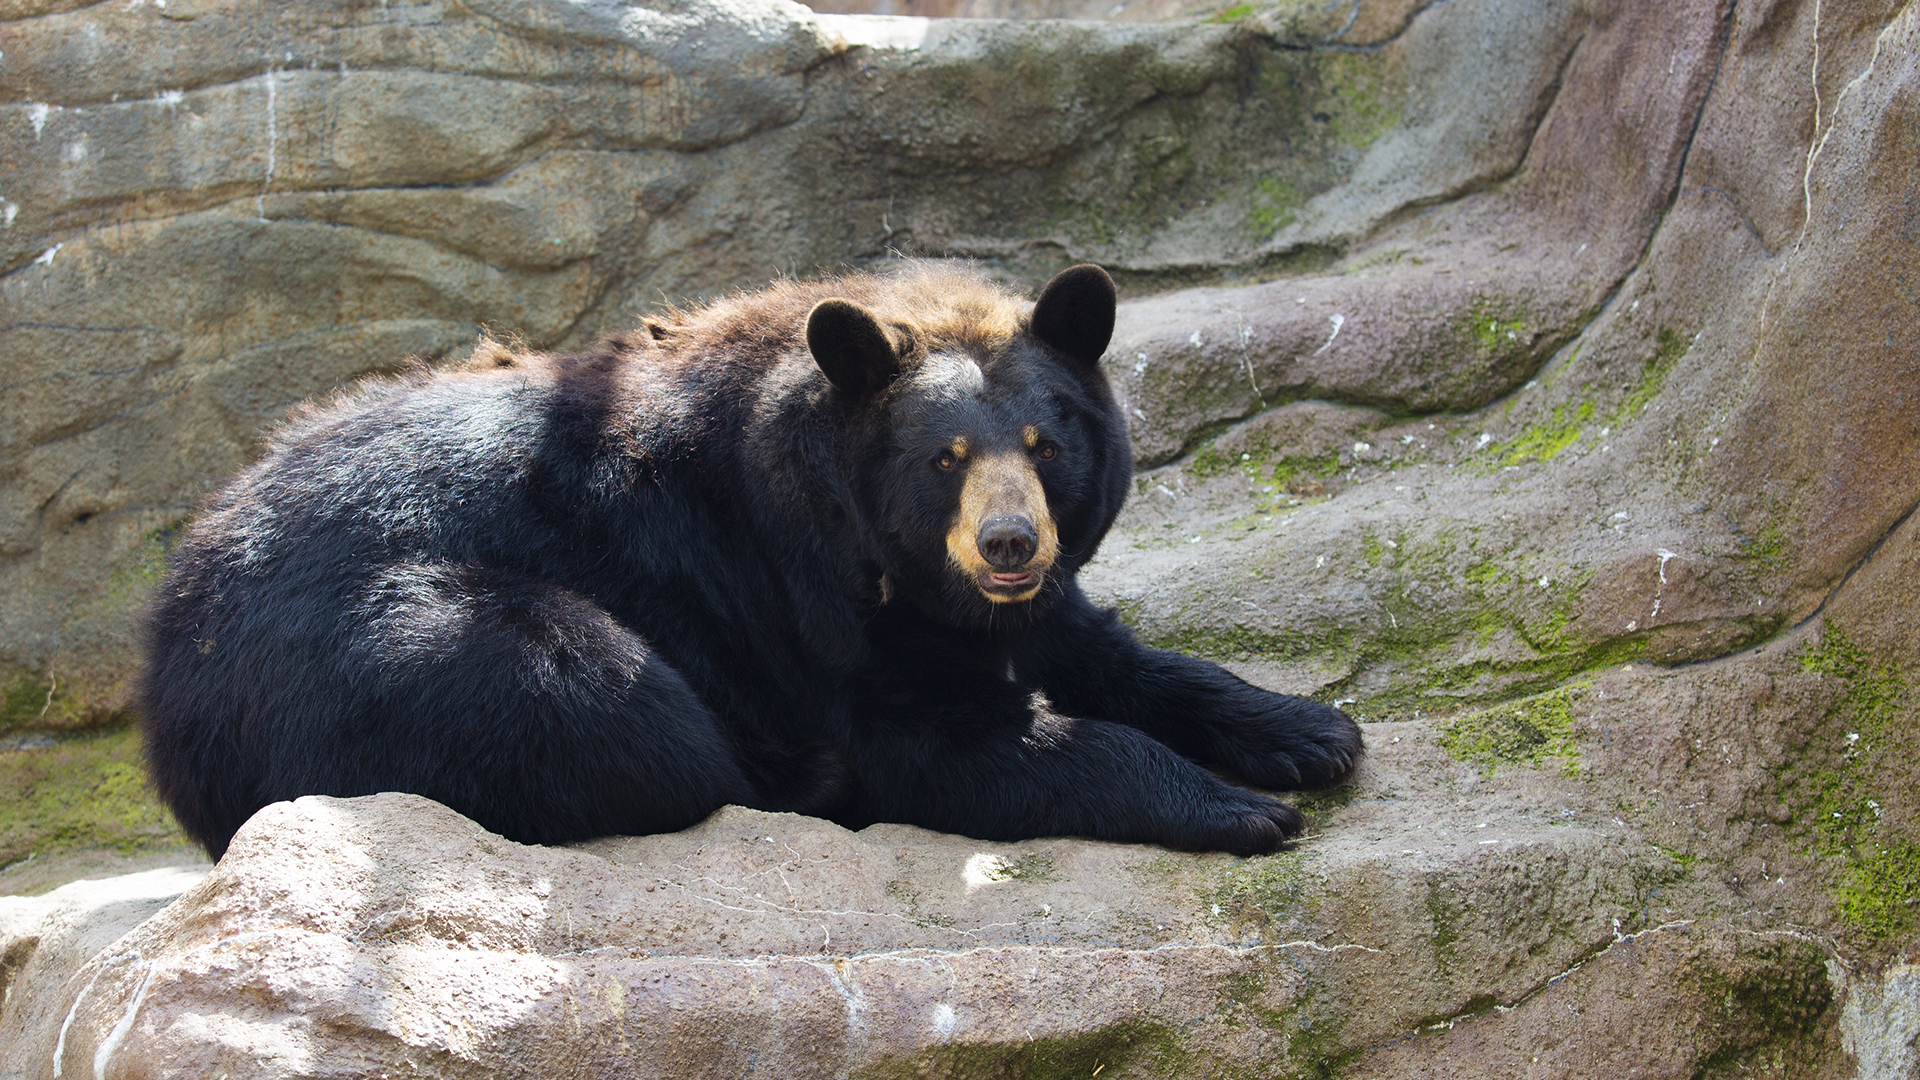 American black bear at Lake Tobias Wildlife Park